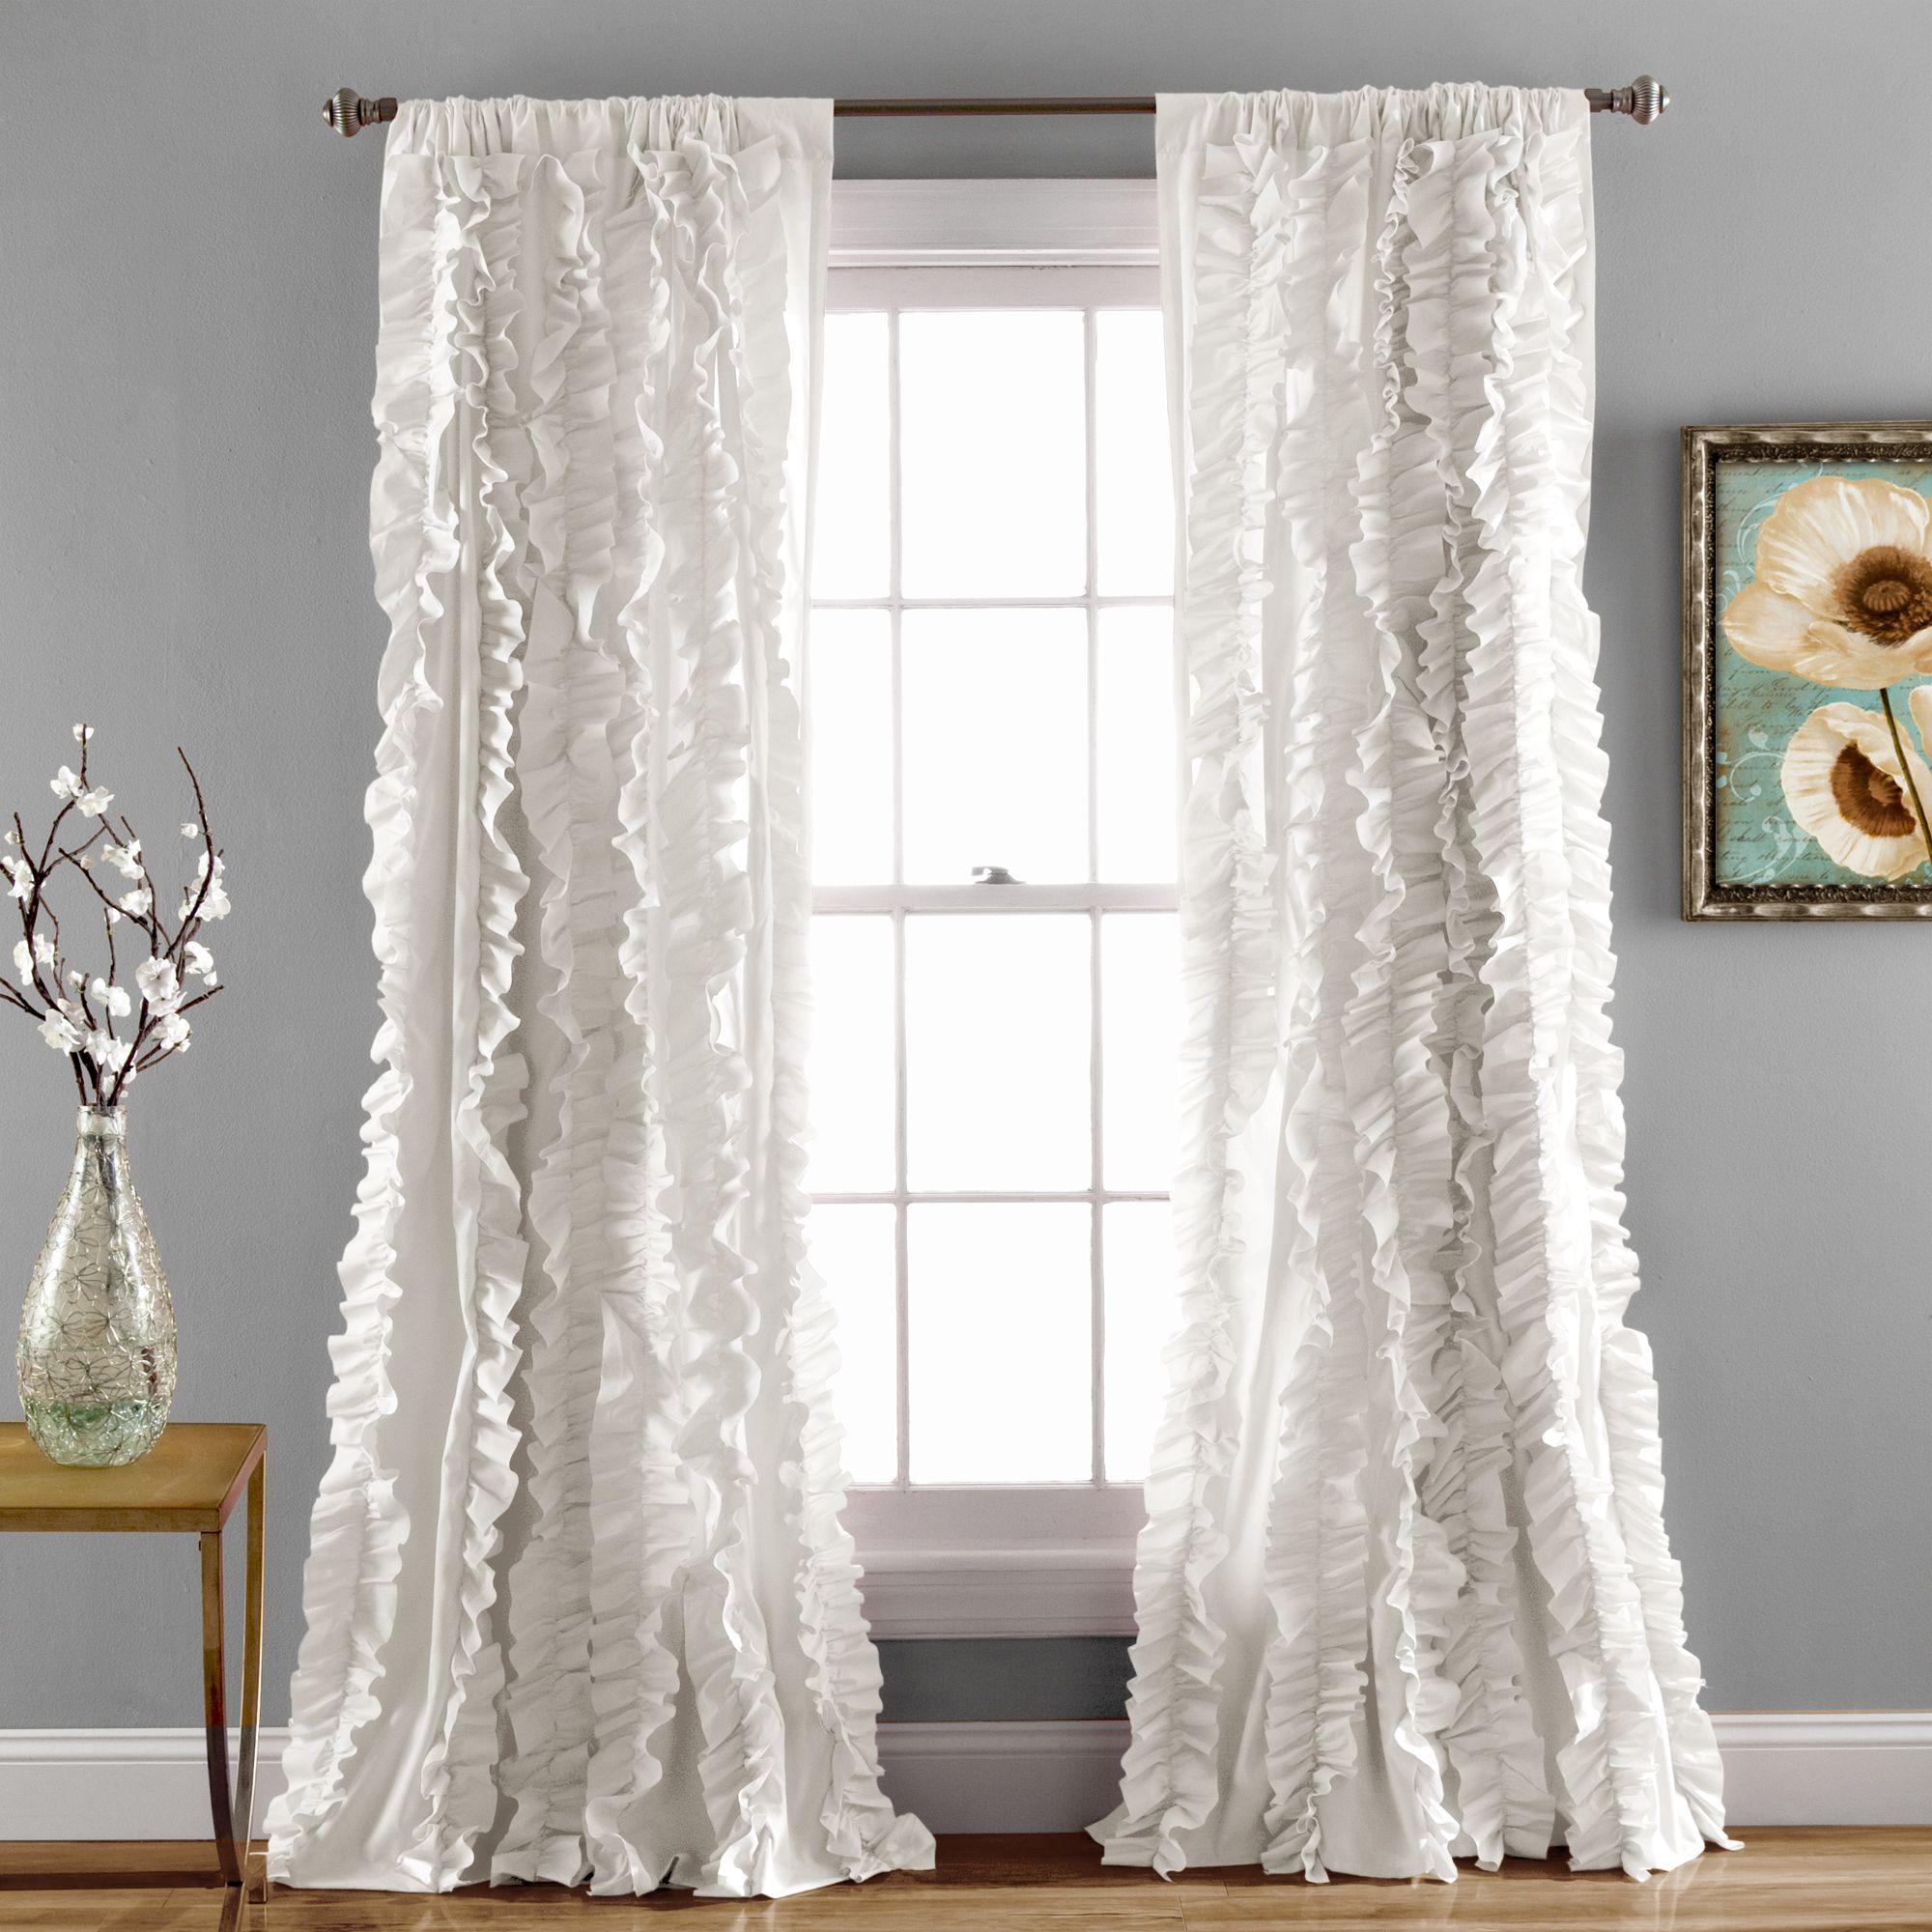 Lush Decor Belle Window Curtain White